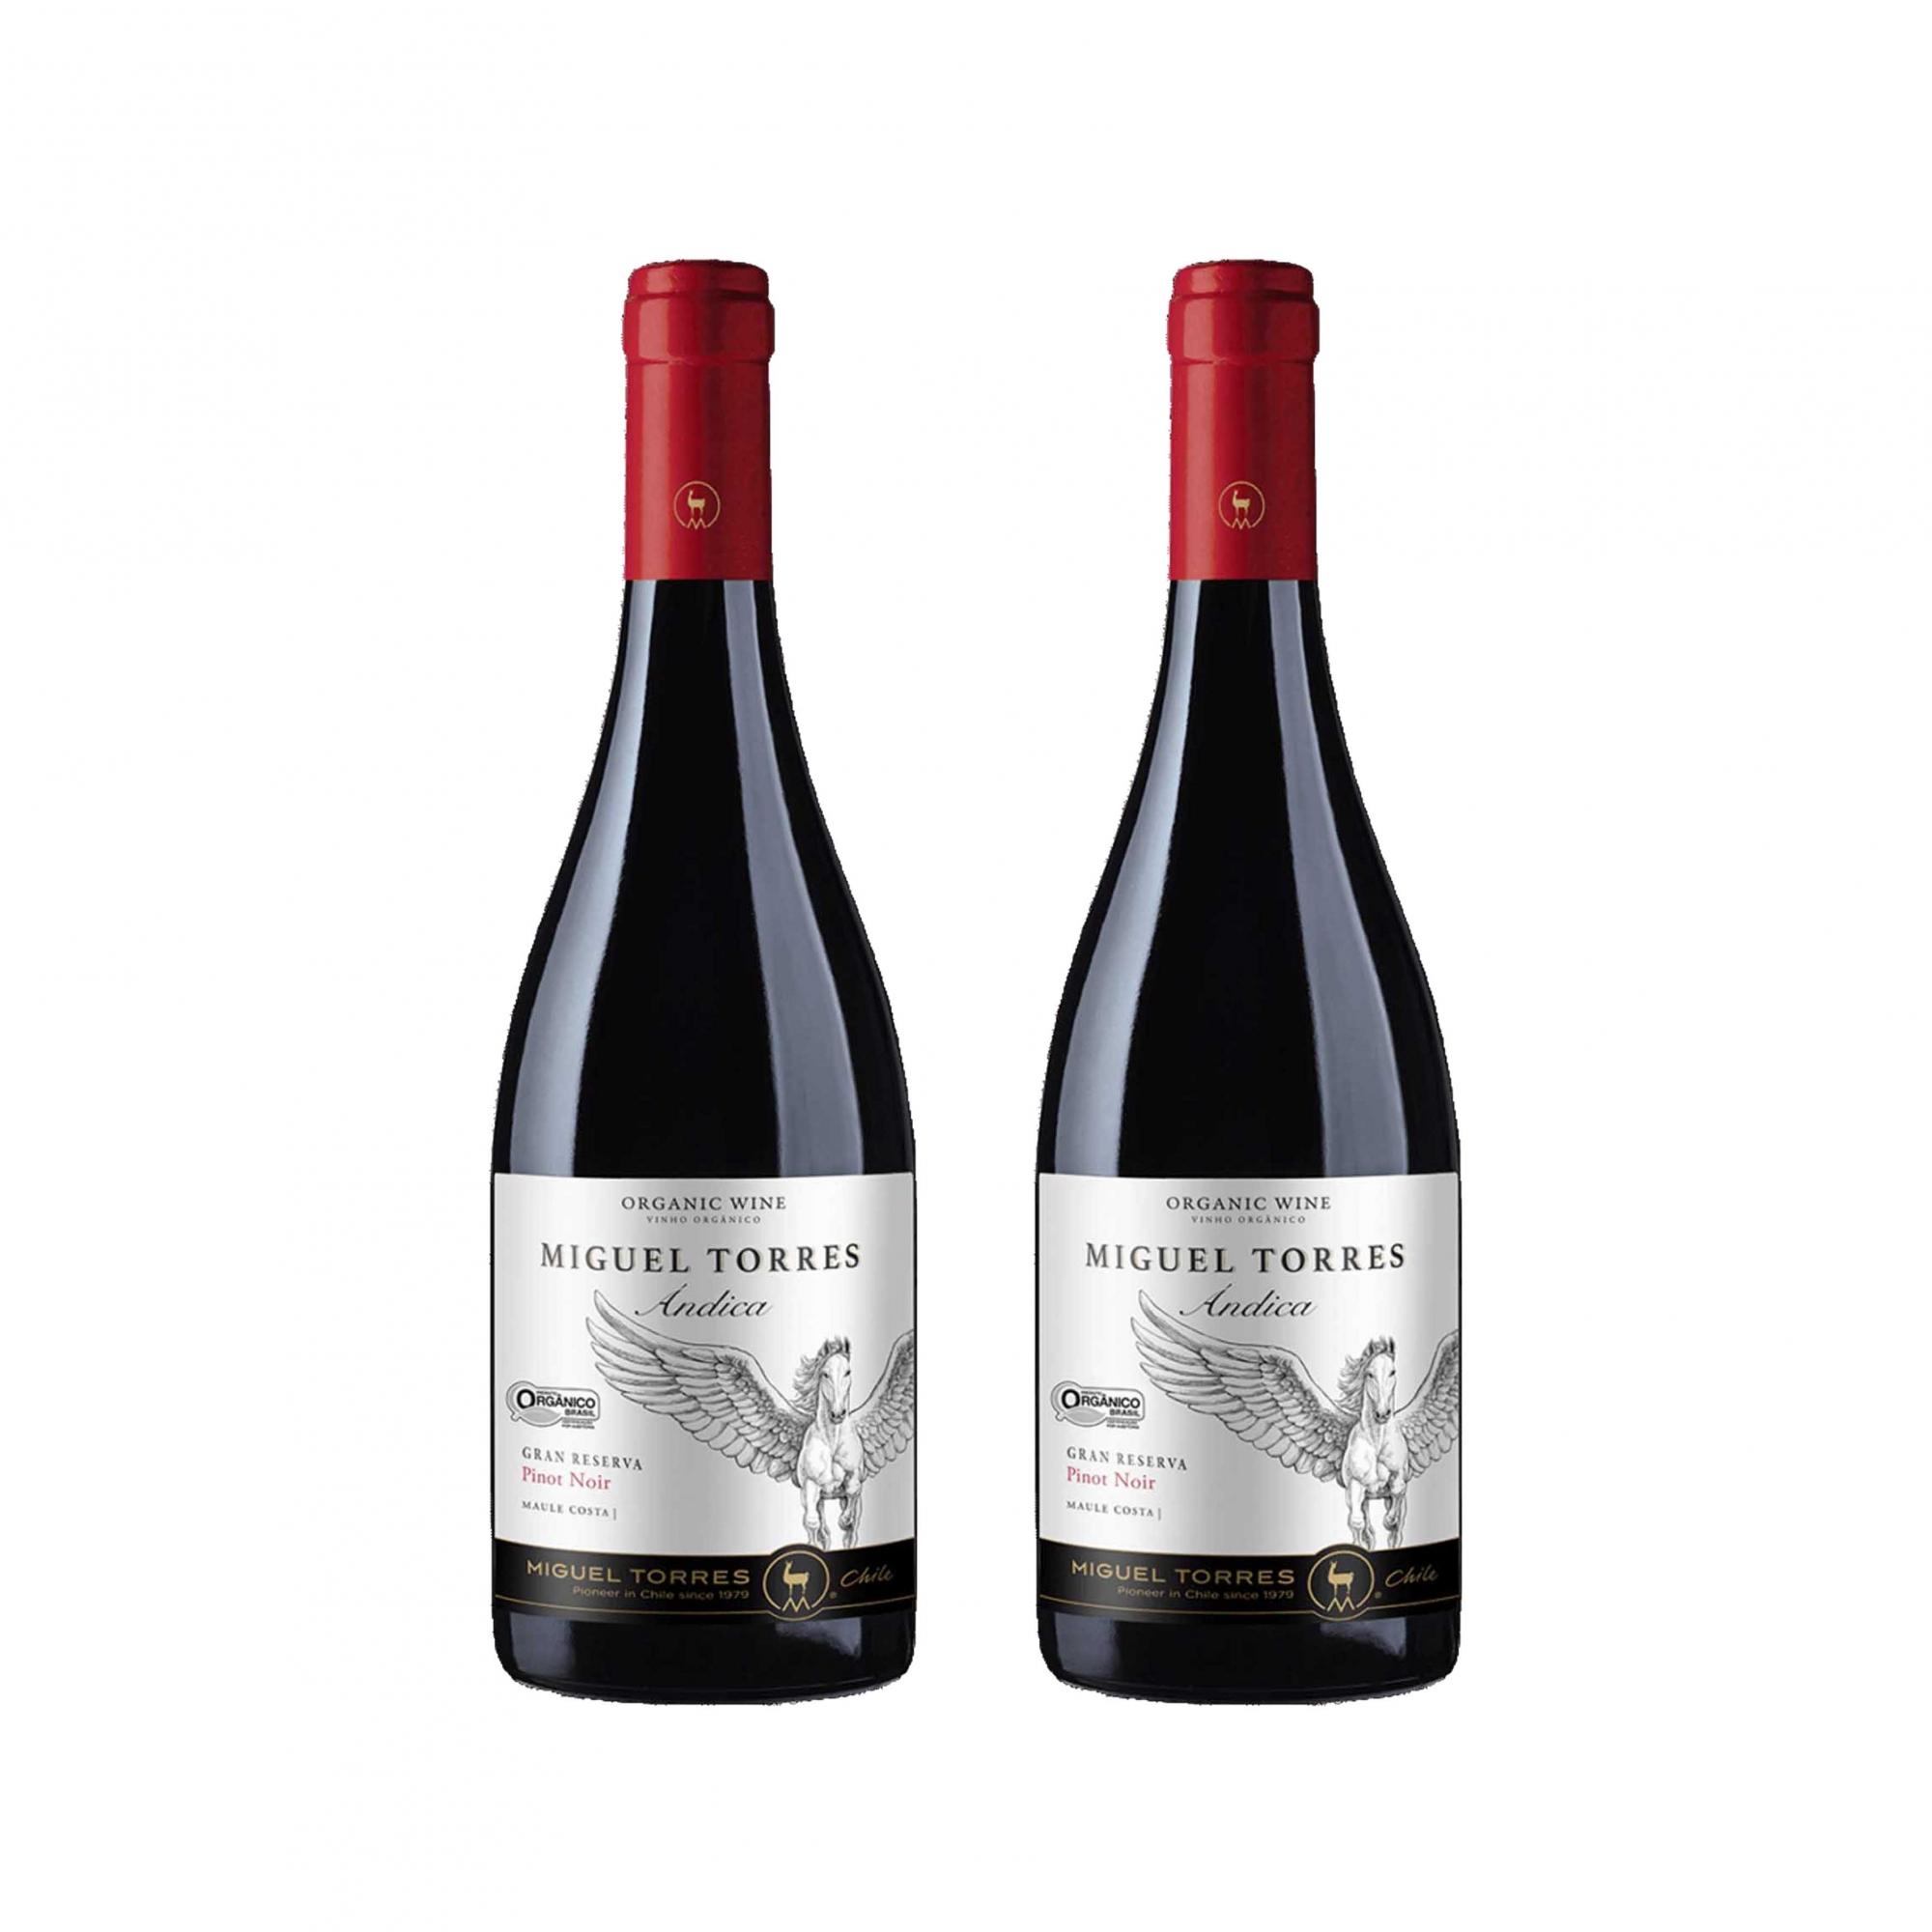 Kit 2x Vinho Tinto Chileno Orgânico Miguel Torres Pinot Noir 2019